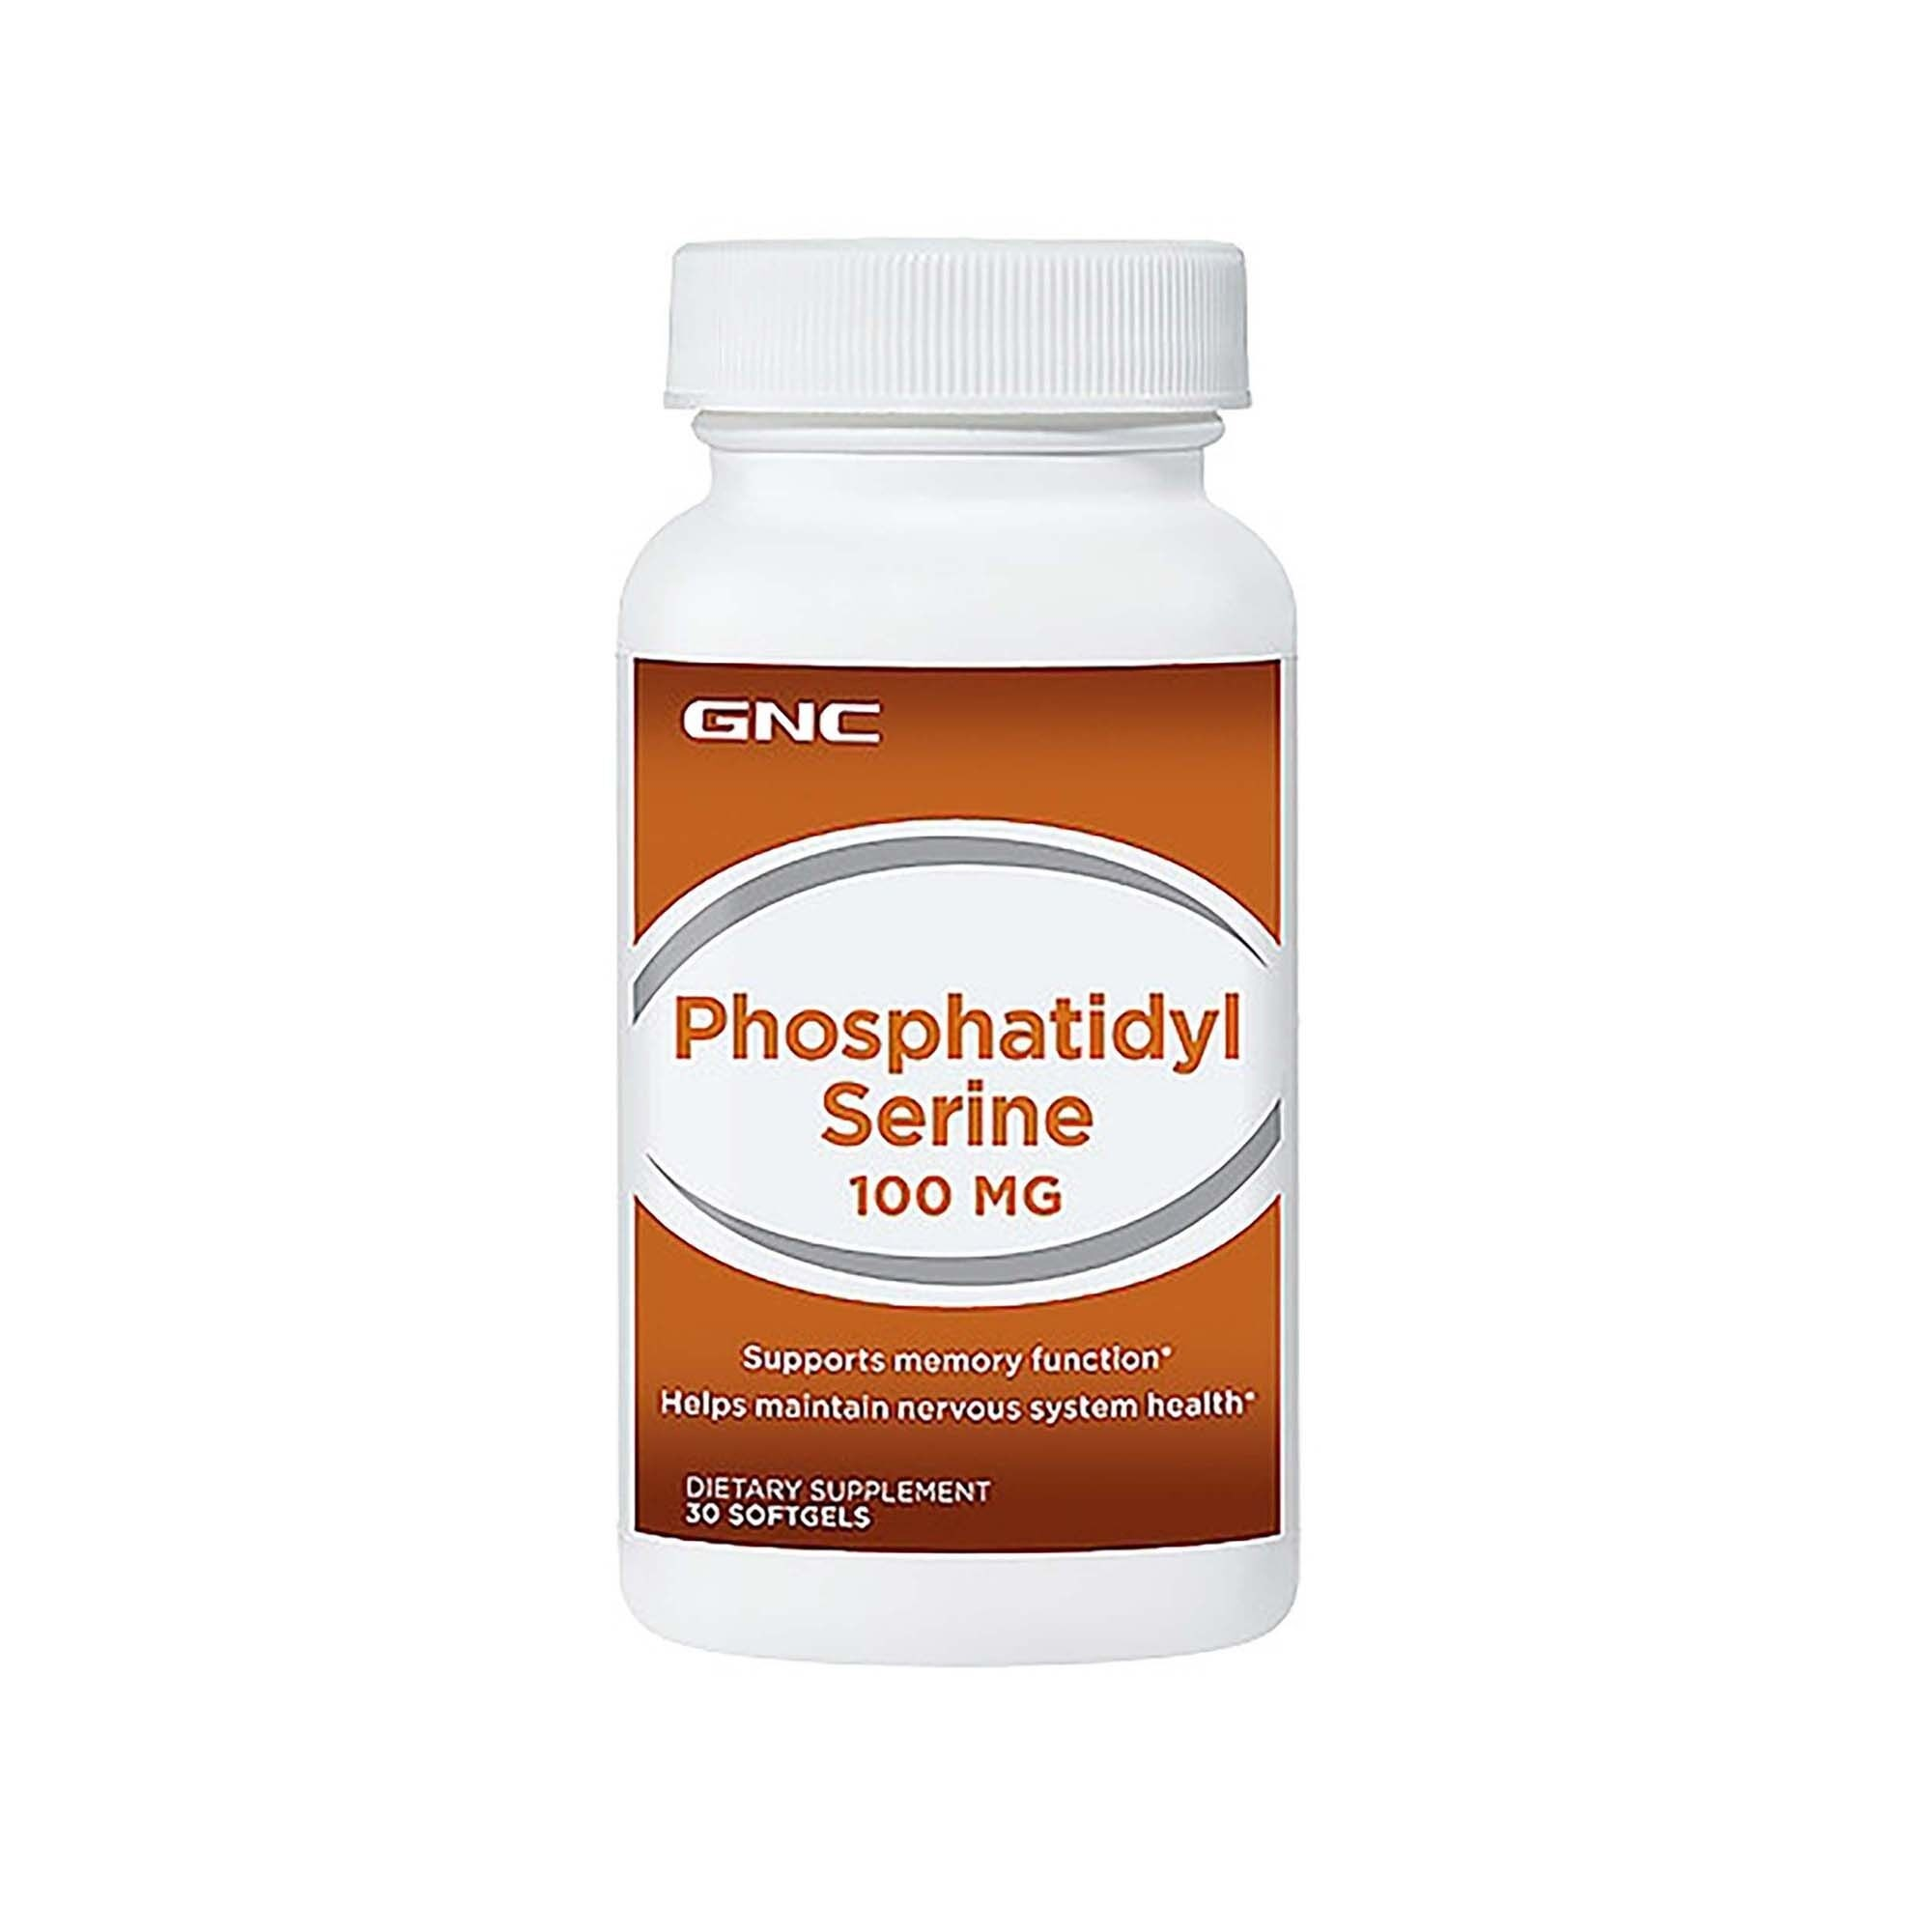 GNC Phosphatidyl Serine 100 mg, Fosfatidil Serina, 30 cps